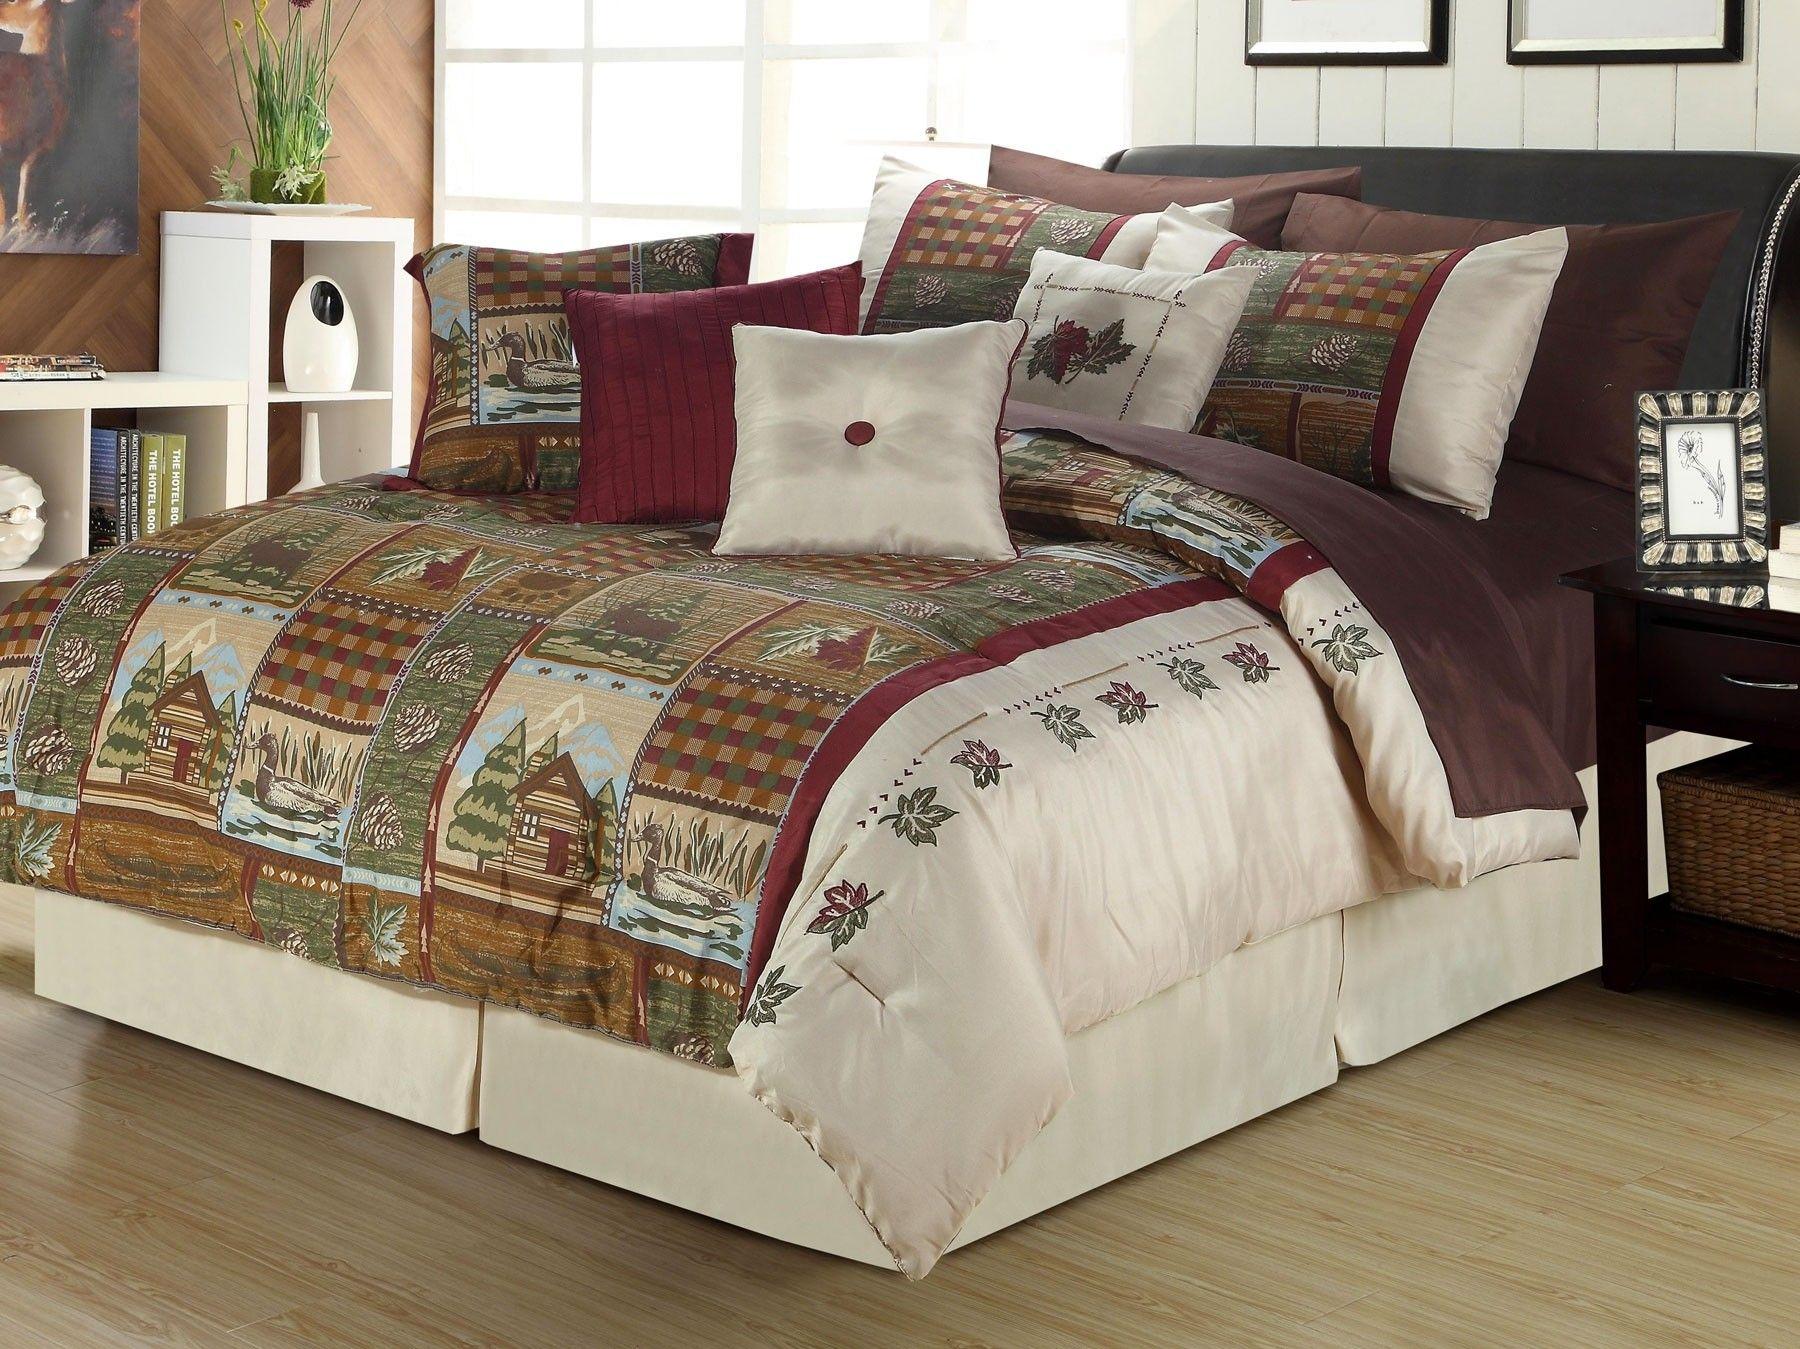 cabin cabins blanket calking comforters approach set size comf comforter california king bedding duck